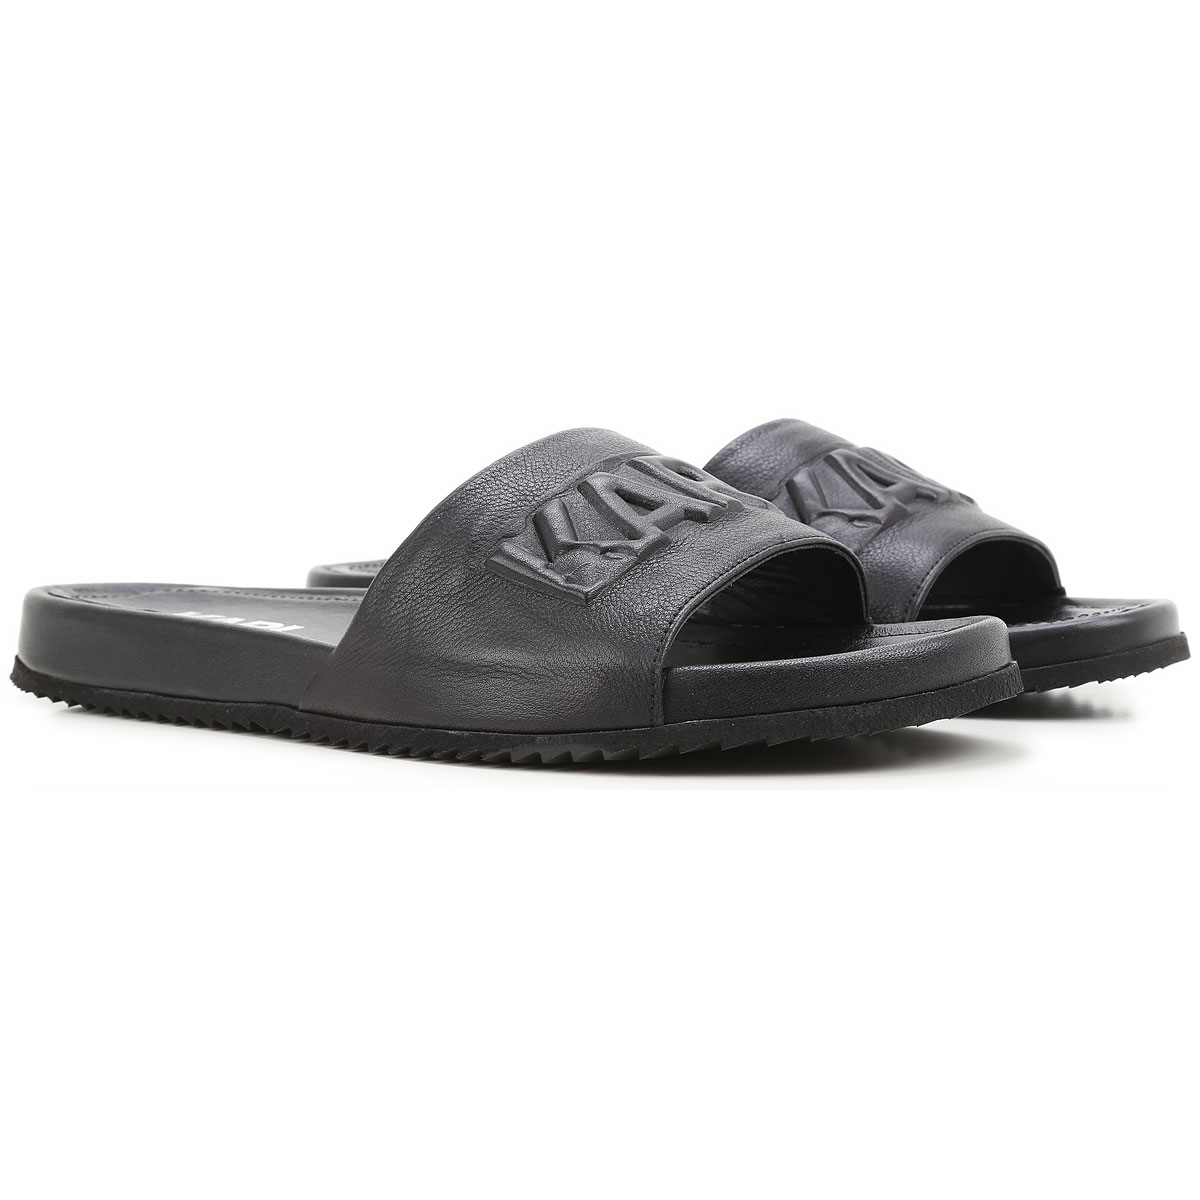 chaussures homme karl lagerfeld code produit 556 124 126. Black Bedroom Furniture Sets. Home Design Ideas